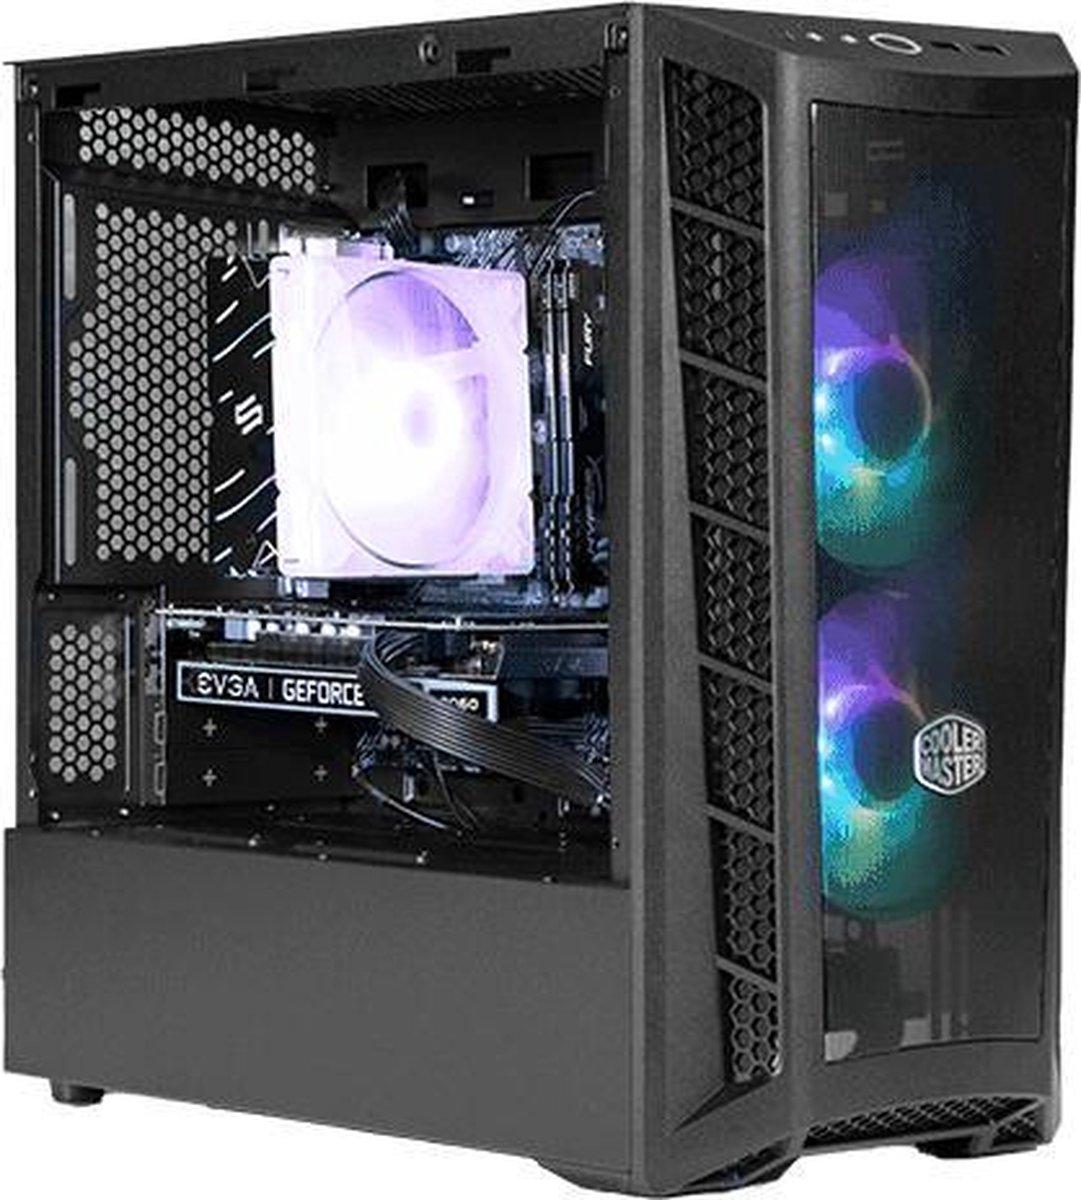 Game PC Redux Gamer Premium i140 - NVIDIA GeForce RTX 3070 - Intel Core i5 10600KF - GB RAM - SSD